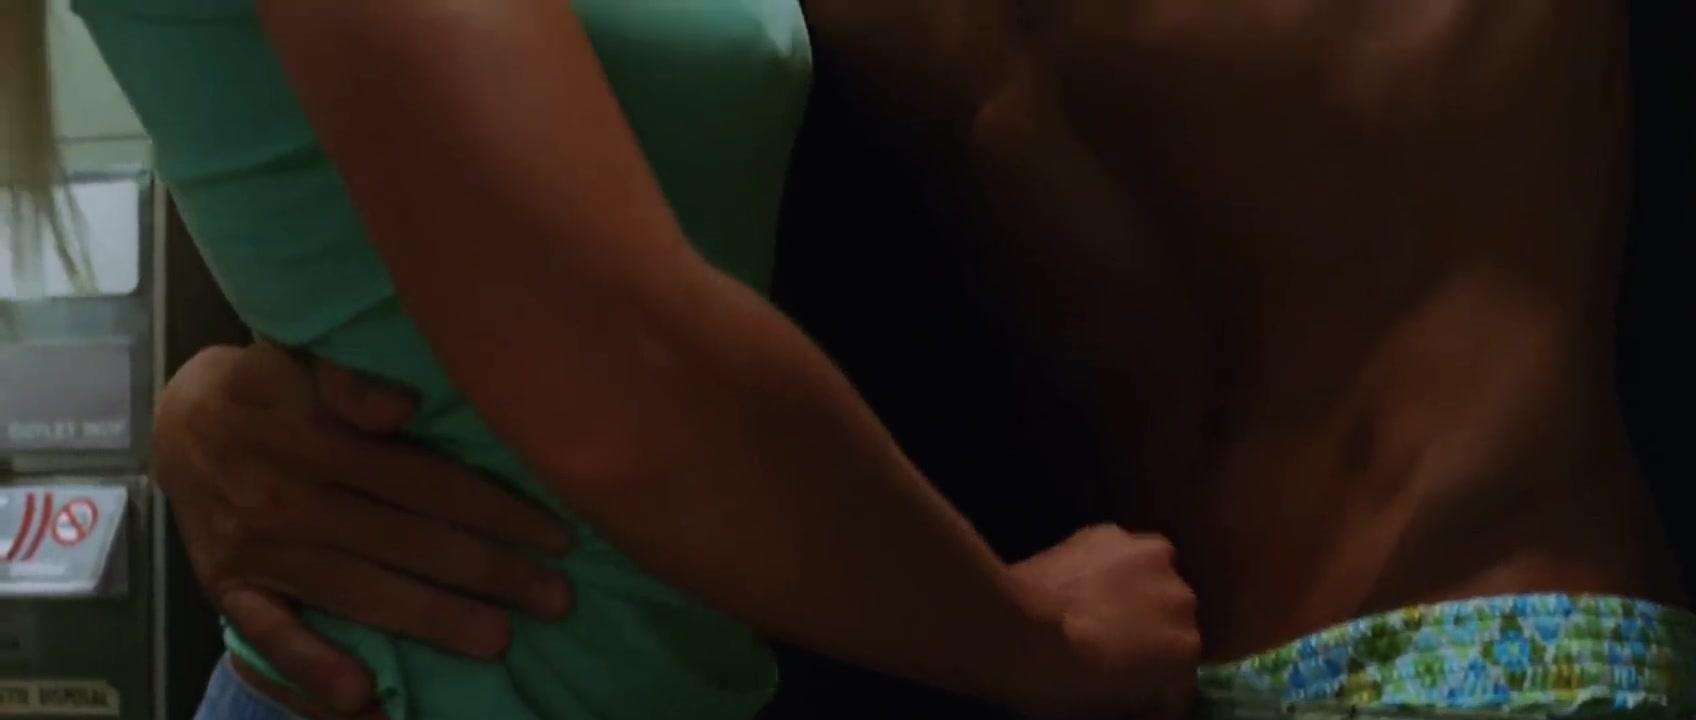 McLeod nackt Samantha  Lea Michele,